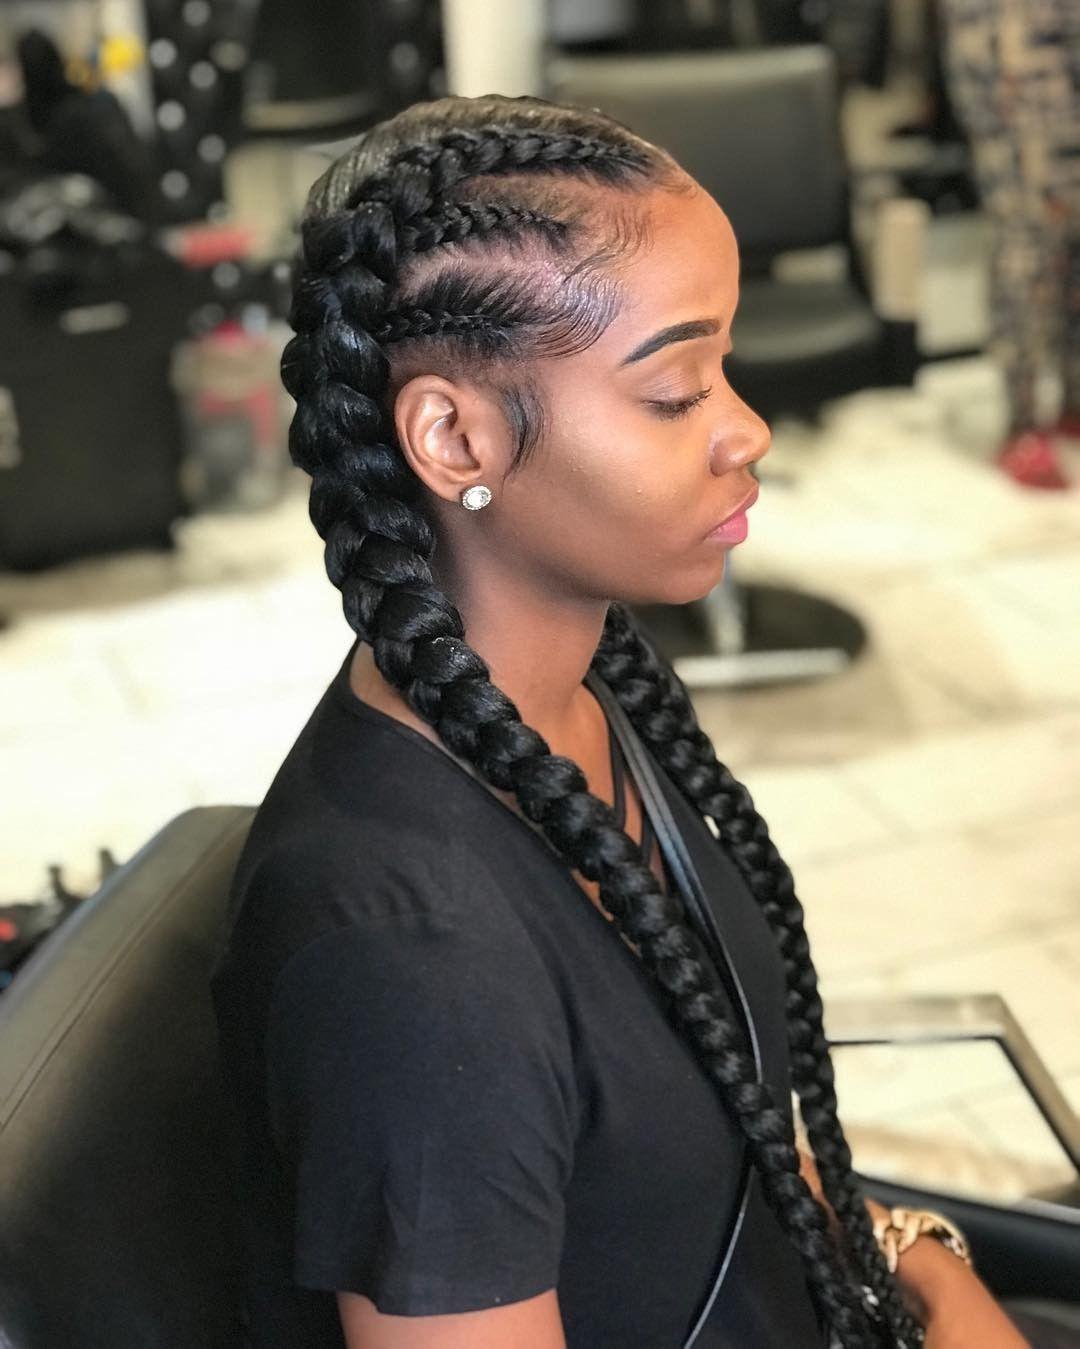 Pin By Alba Jimenez On Hair Two Braid Hairstyles Braided Hairstyles Cornrow Hairstyles